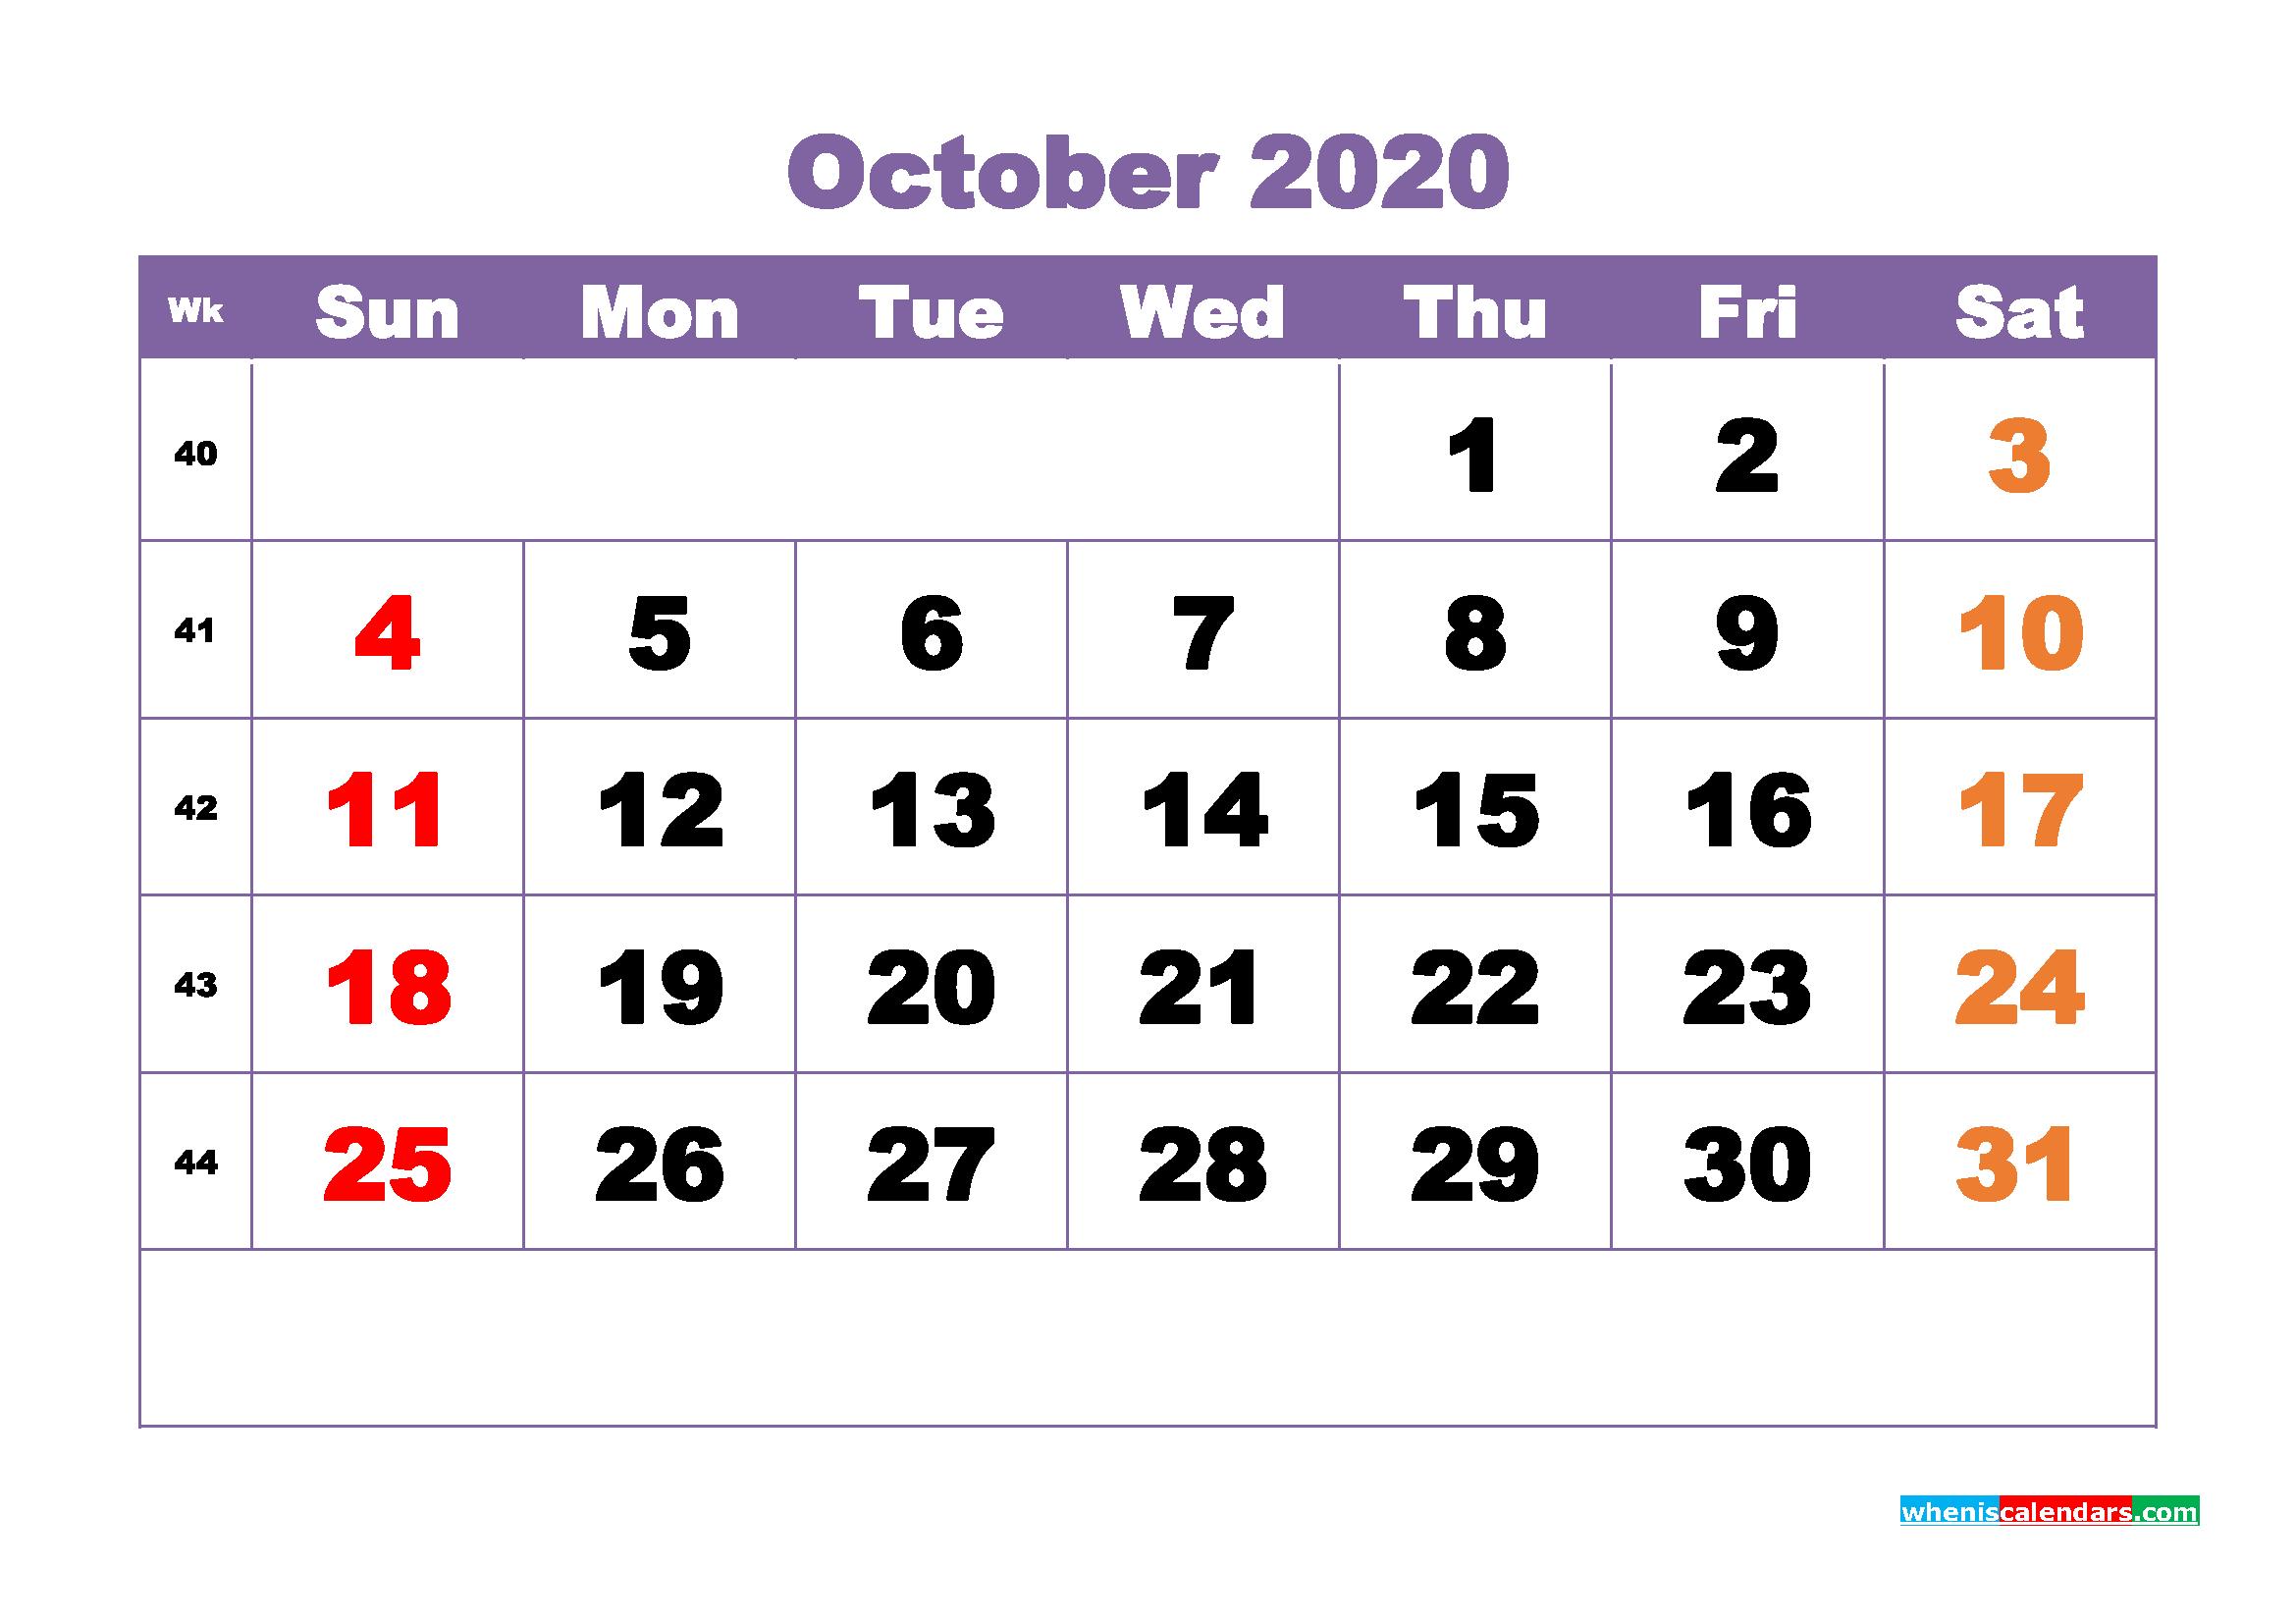 October Printable Calendar 2020 PDF, Word - No.m20b382